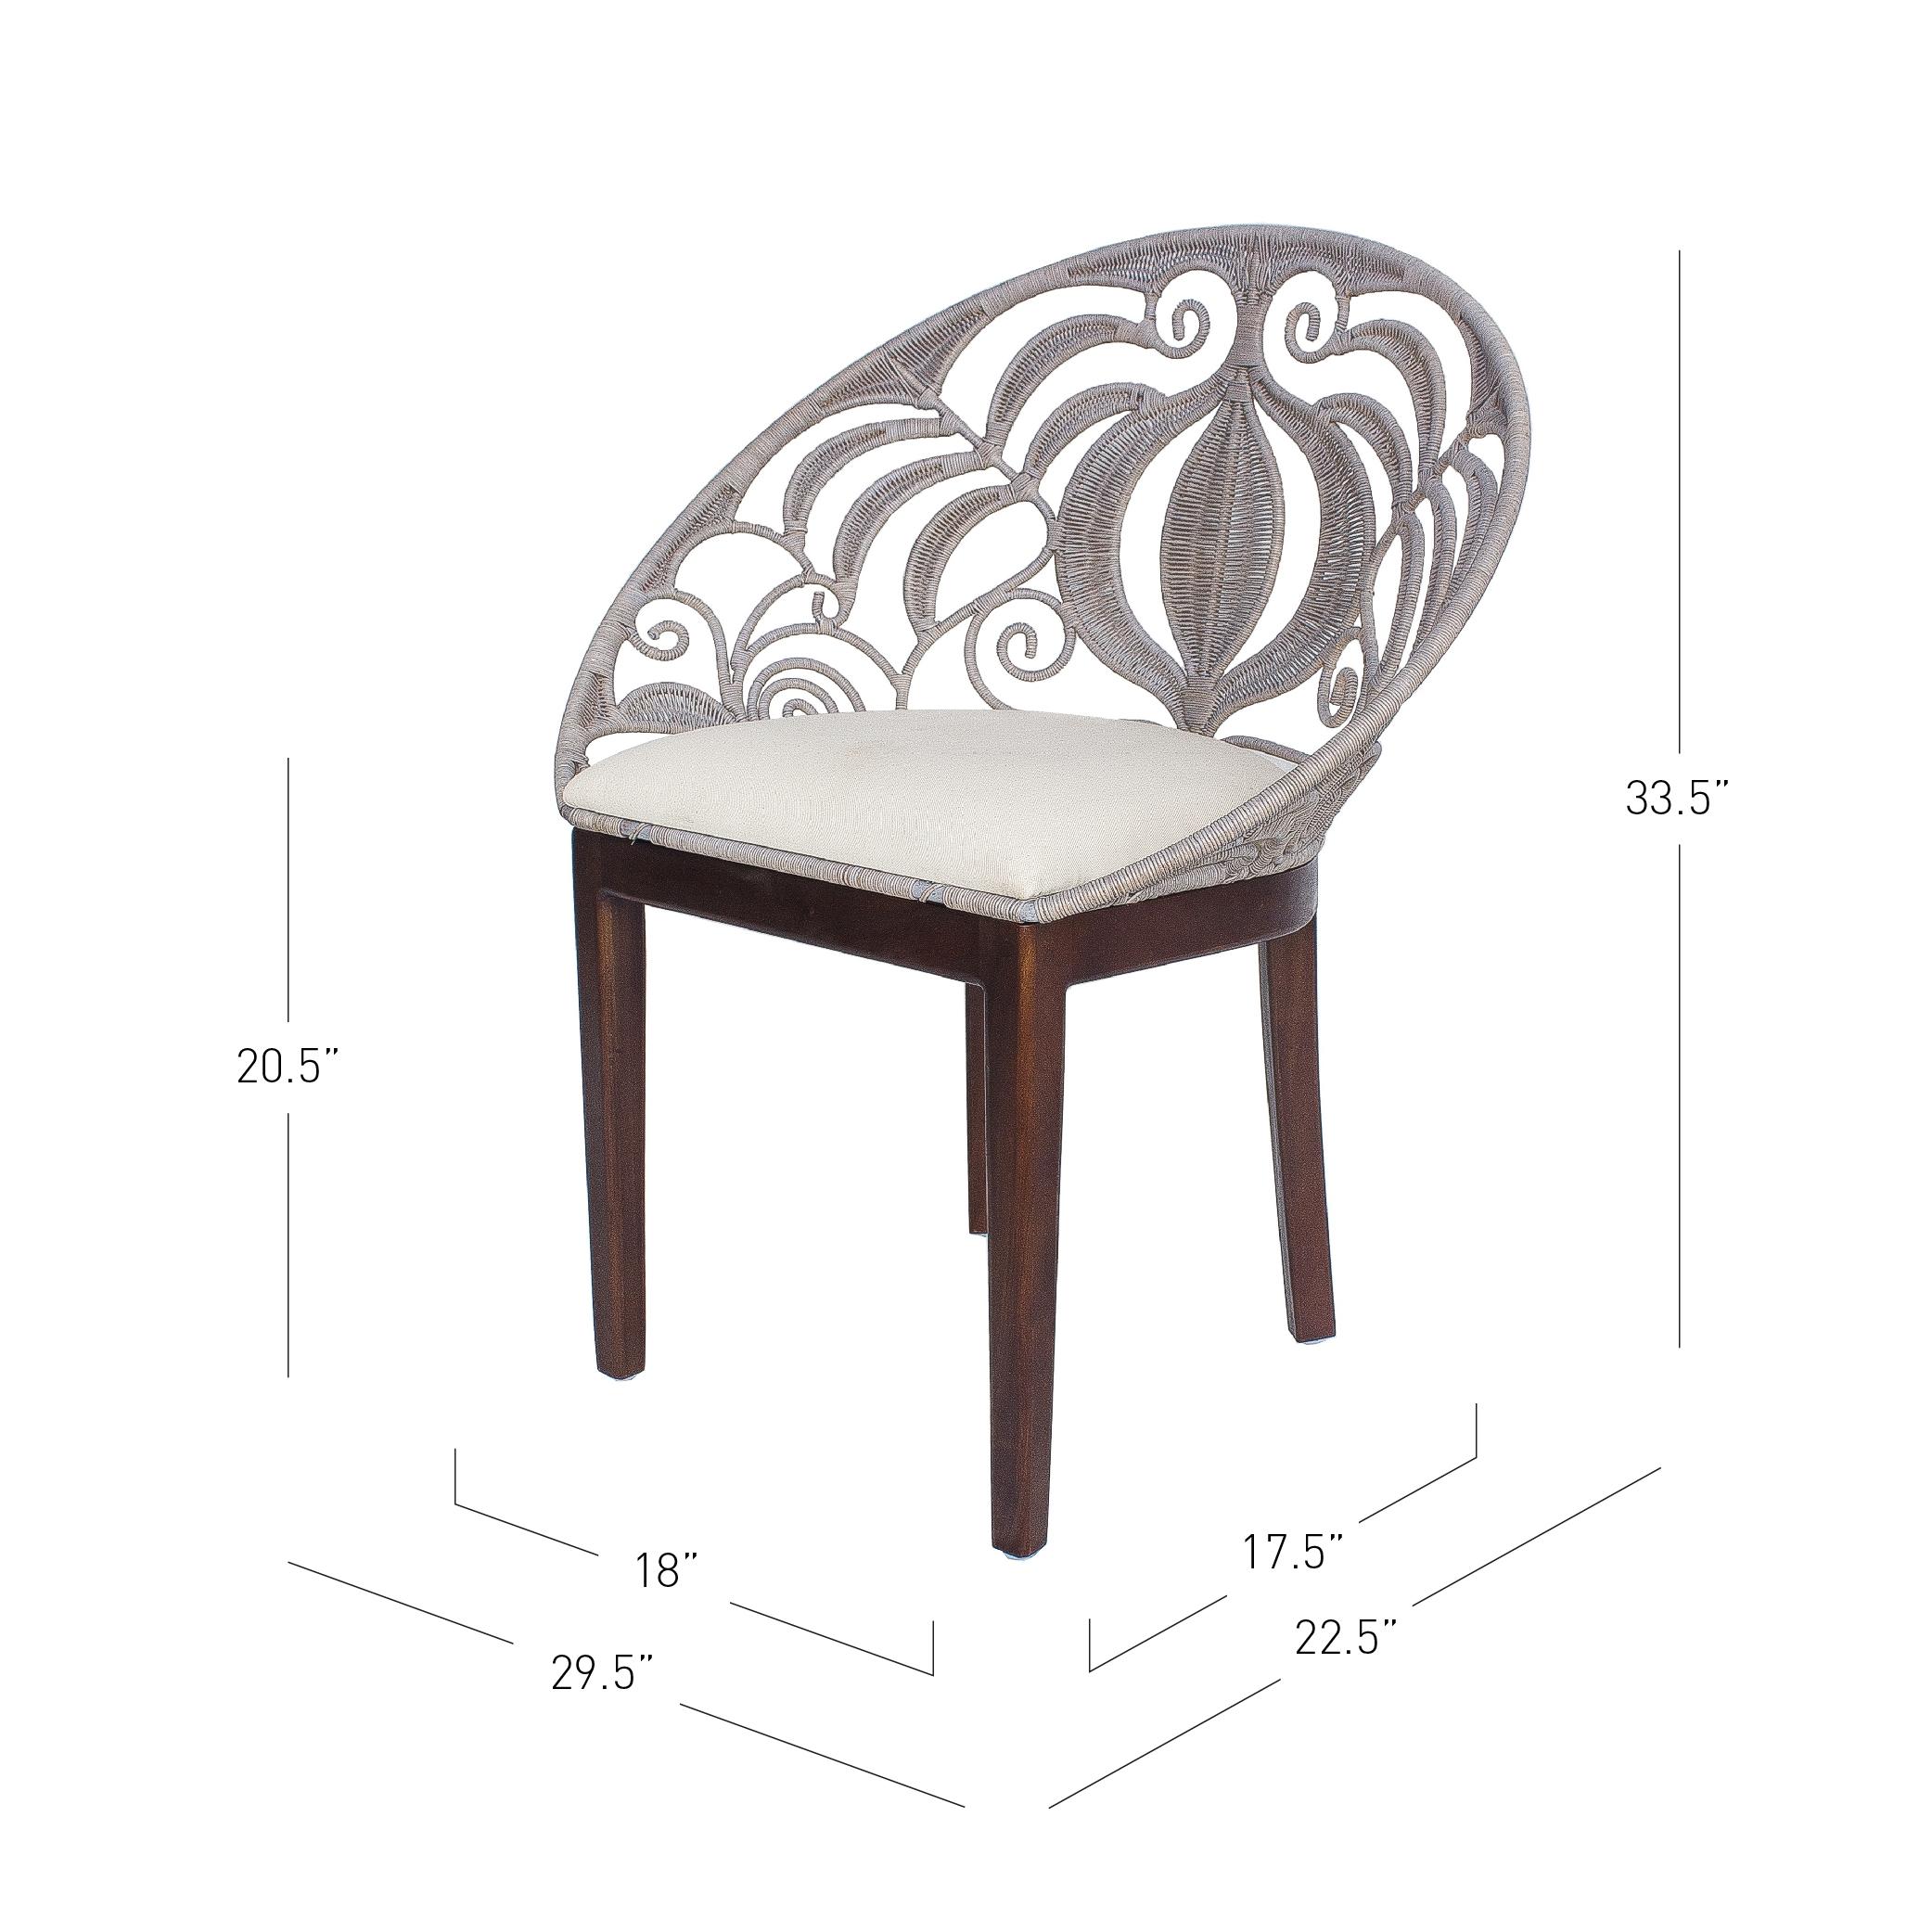 1040002 Npd Furniture Wholesale Lifestyle Furniture